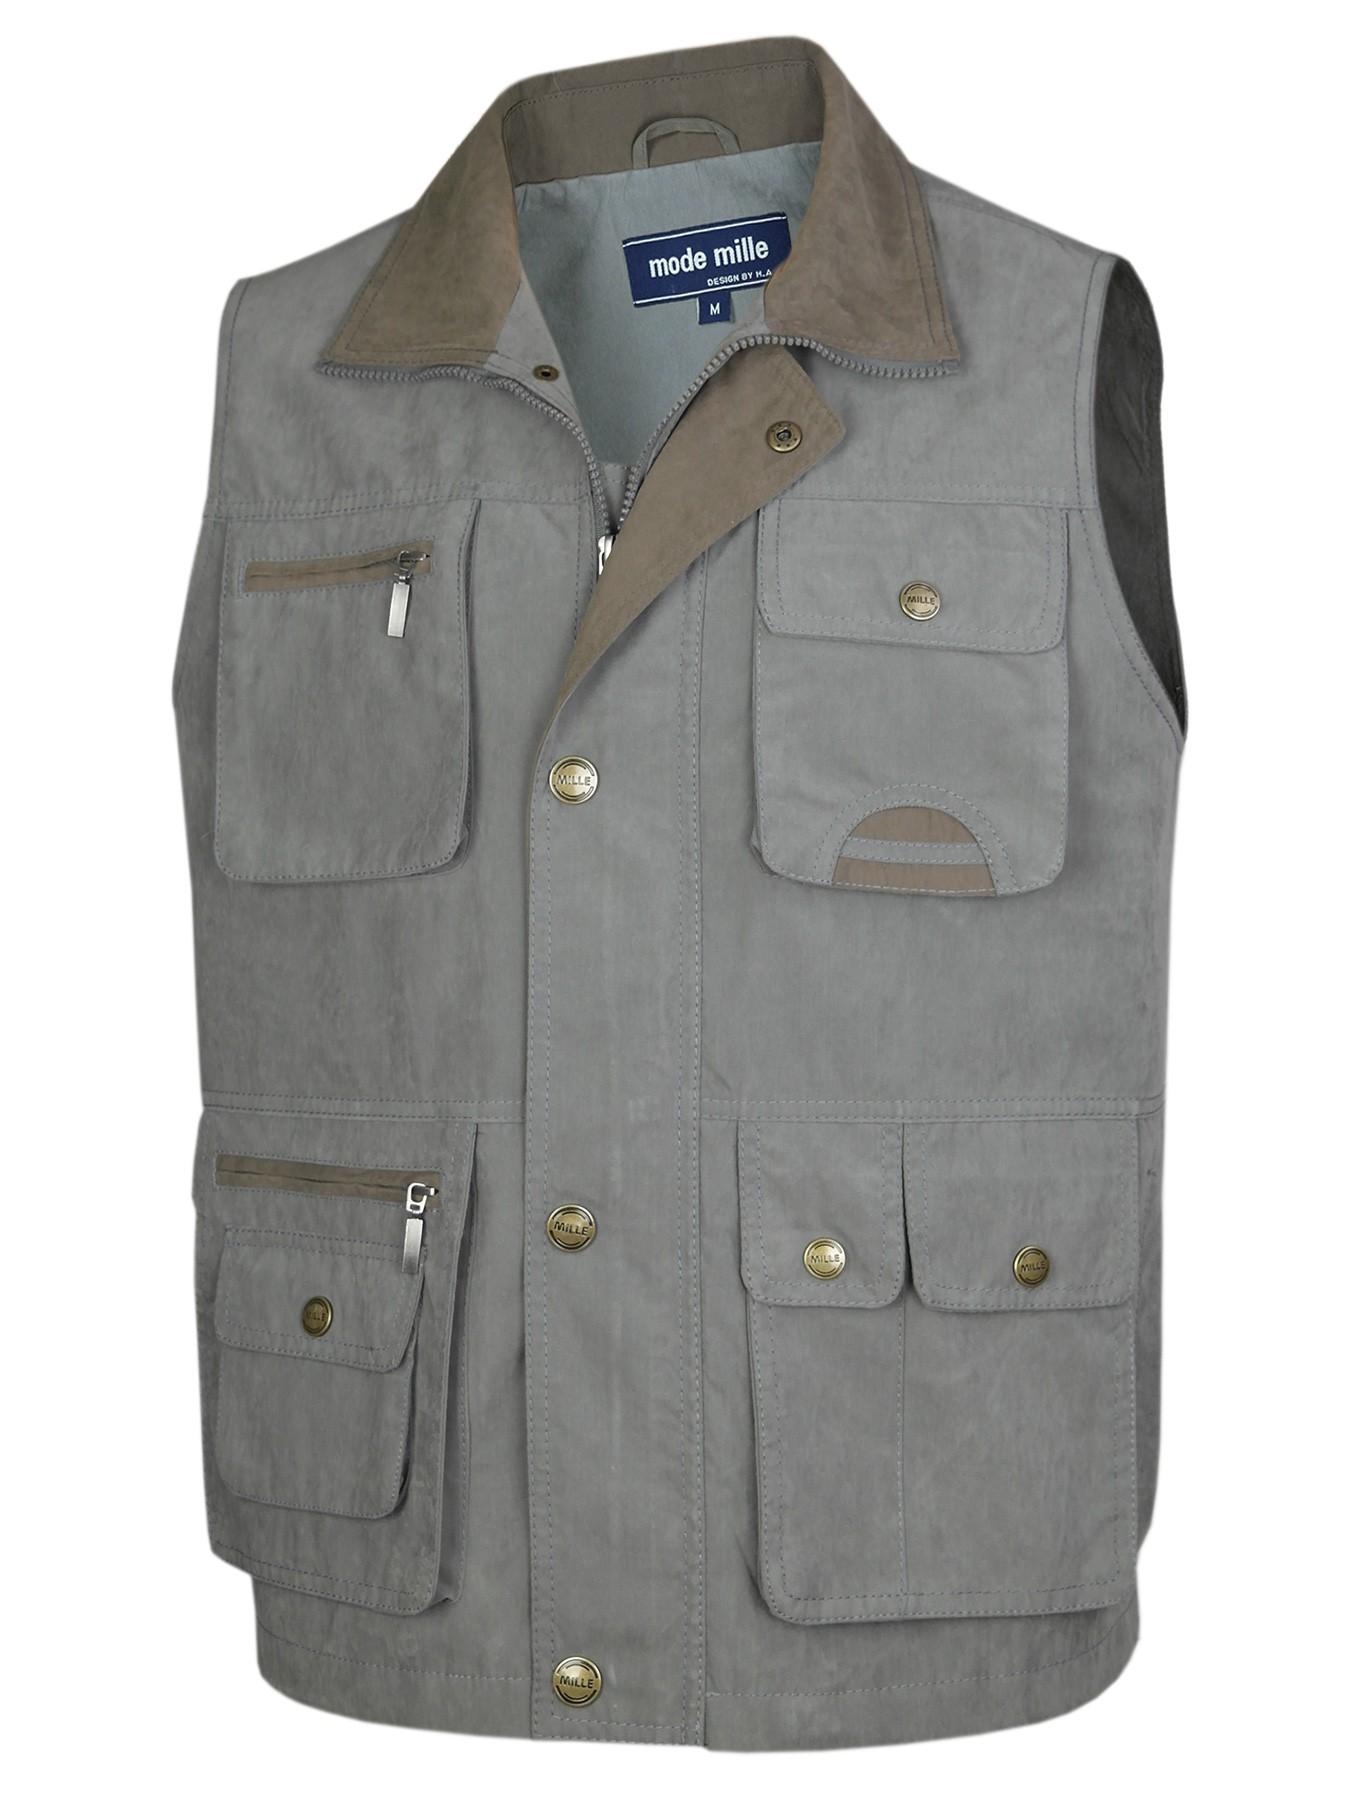 Herren Weste Outdoor Funktions-Weste Multi Taschen - Grau